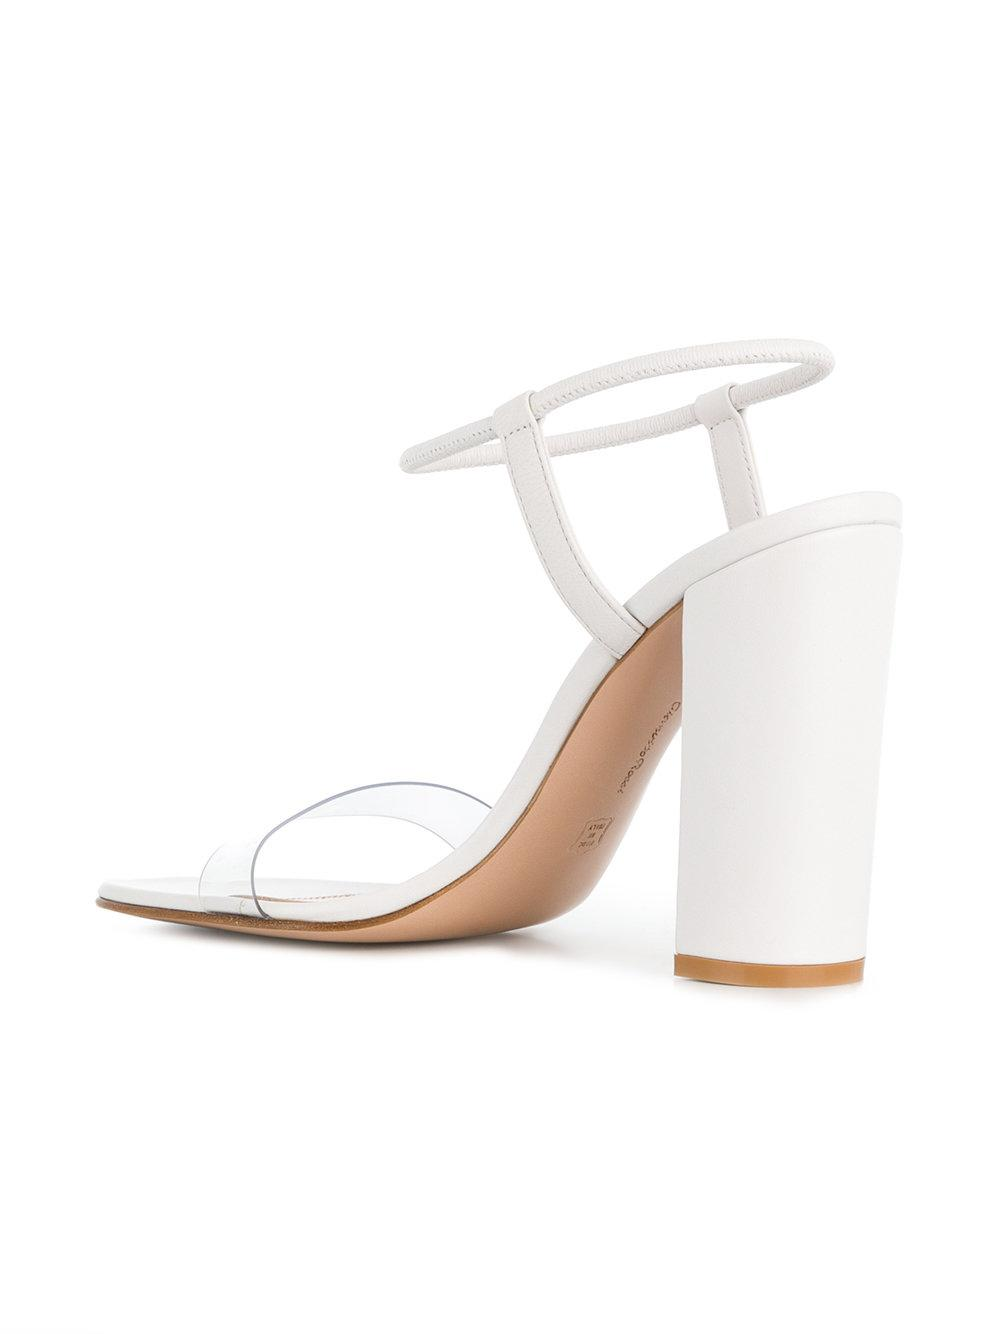 Yeezy transparent strap sandals - Black farfetch Estate Envío Libre Mejor Lugar 7sqRwPNR